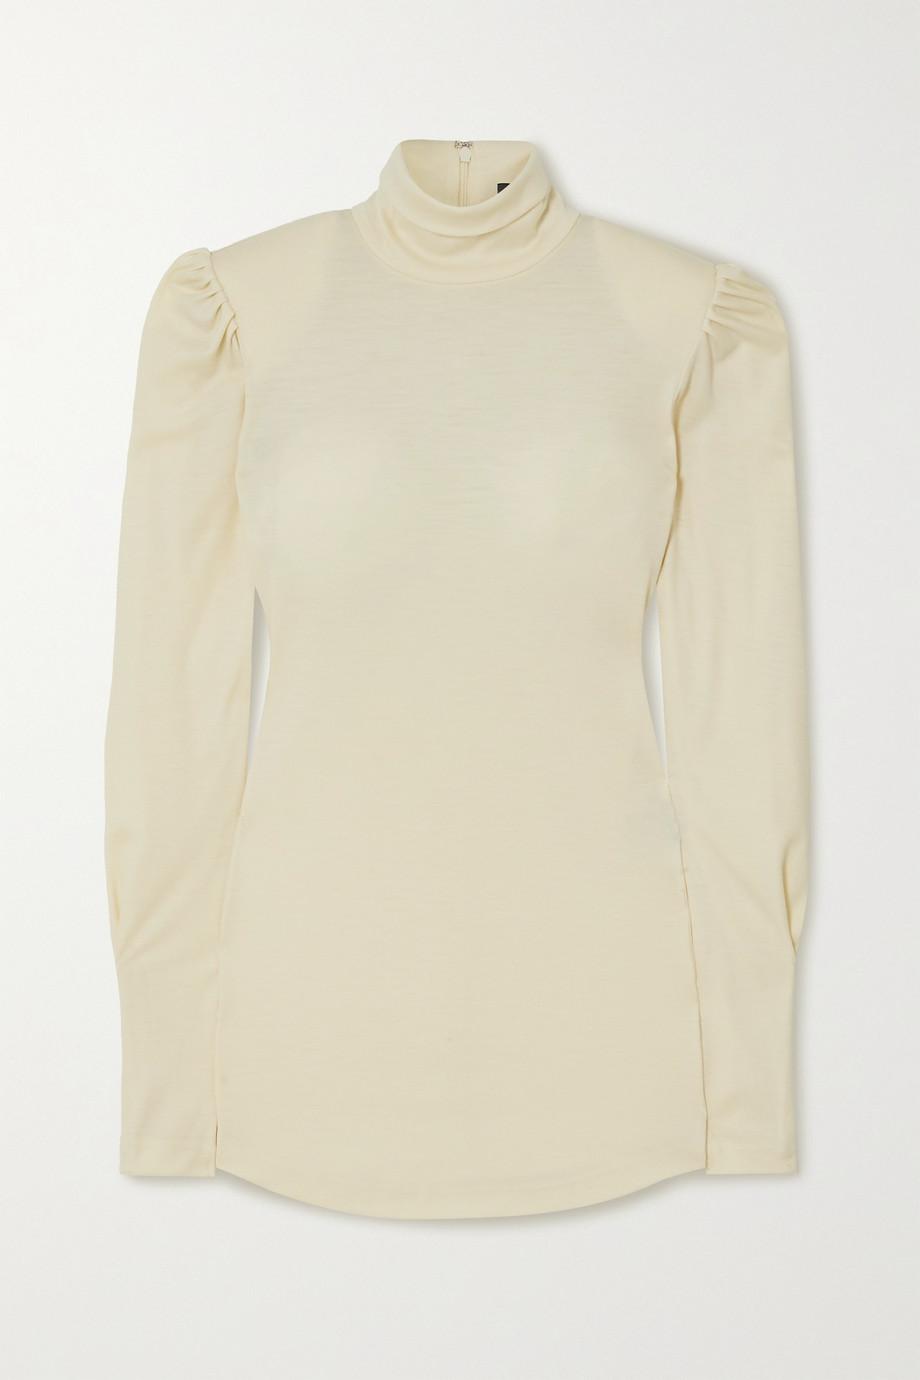 Isabel Marant Gavina wool turtleneck top